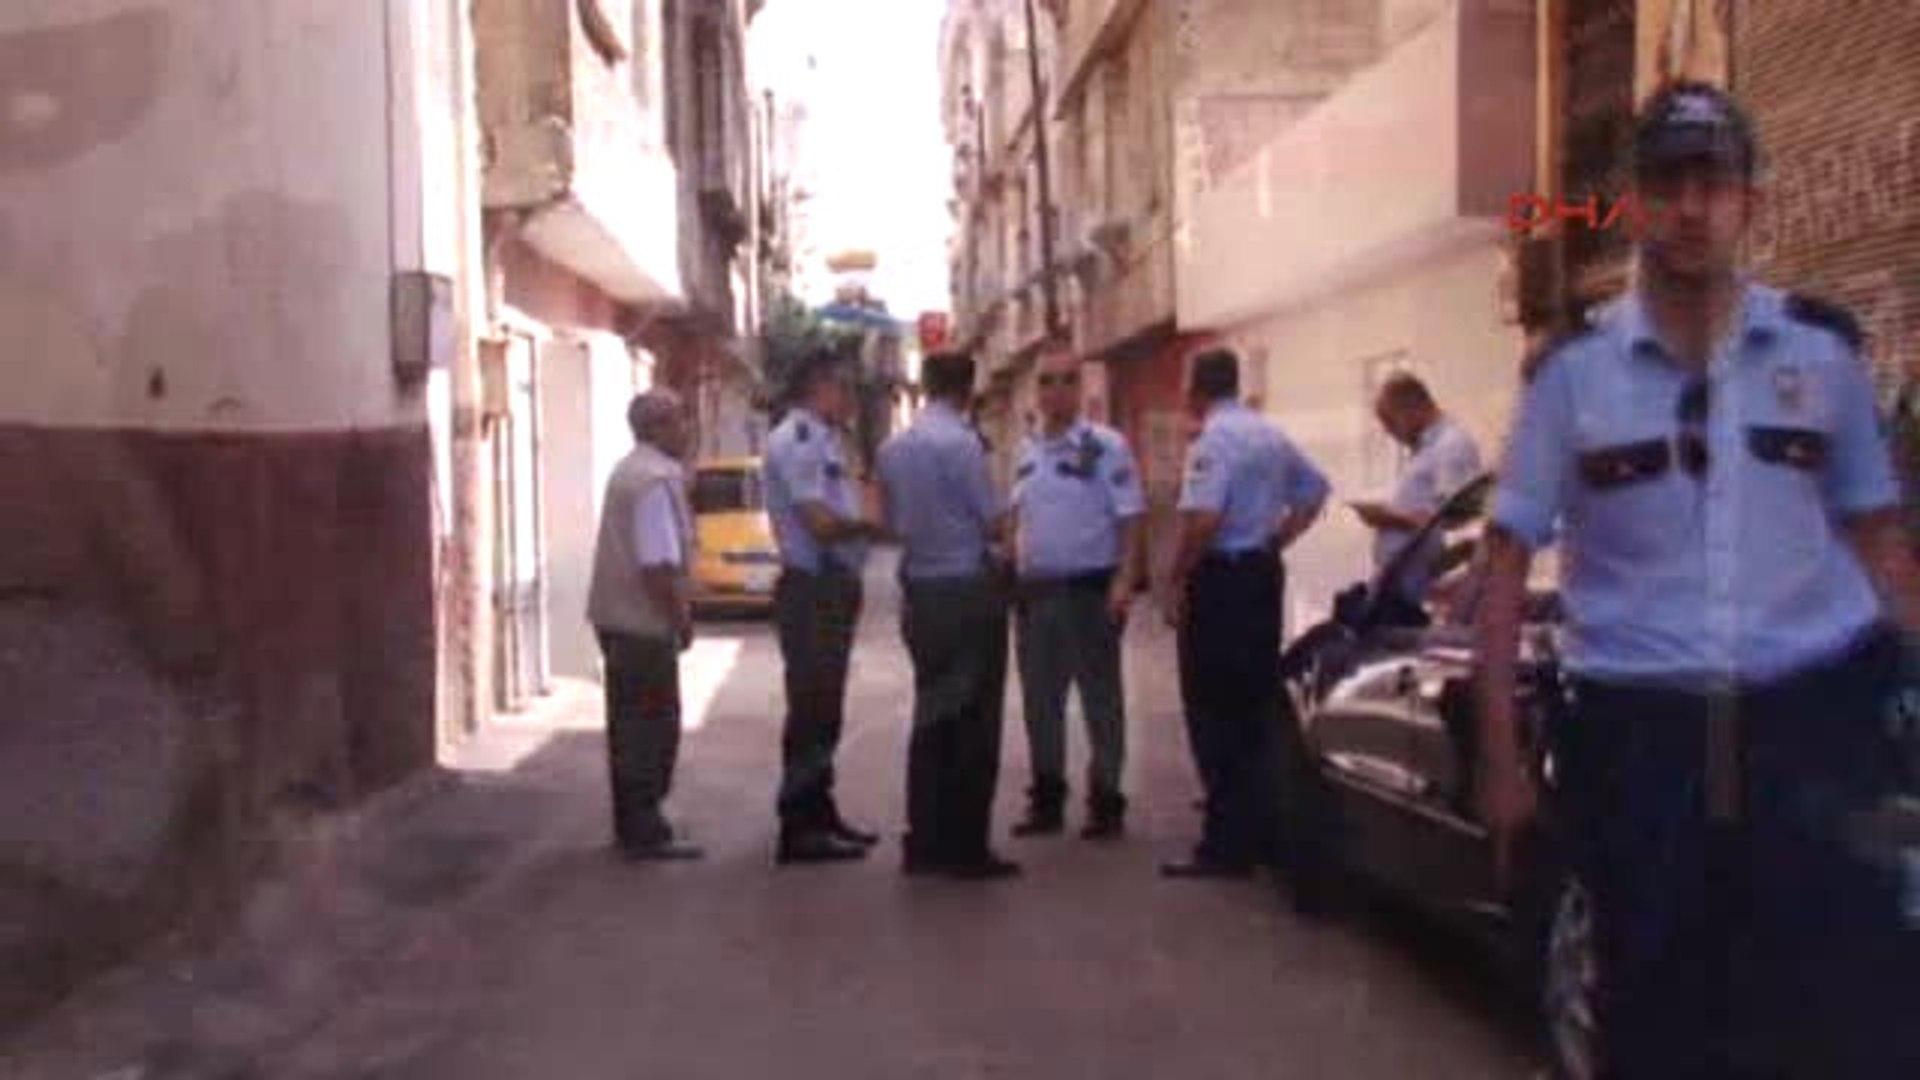 Gaziantep Taksi Göndermeyen Durağa Maytap Attı: 2 Yaralı